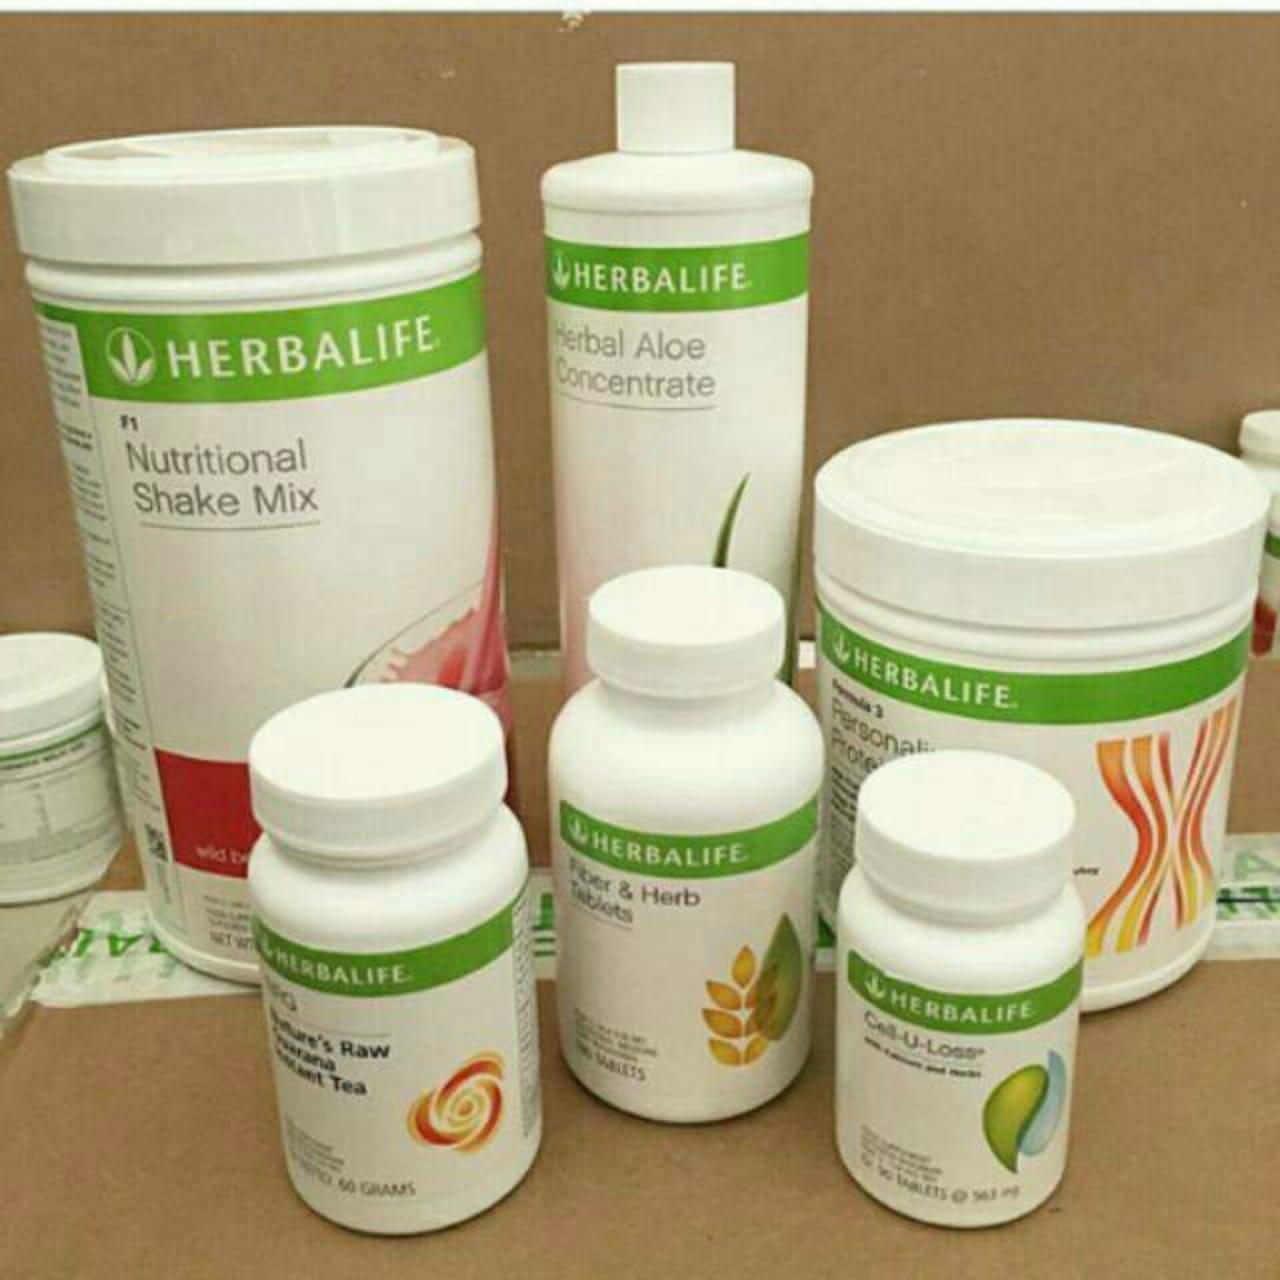 herbalife_#paket cepat kurus (shake, aloe, ppp, cell u loss, fiber, nrg)